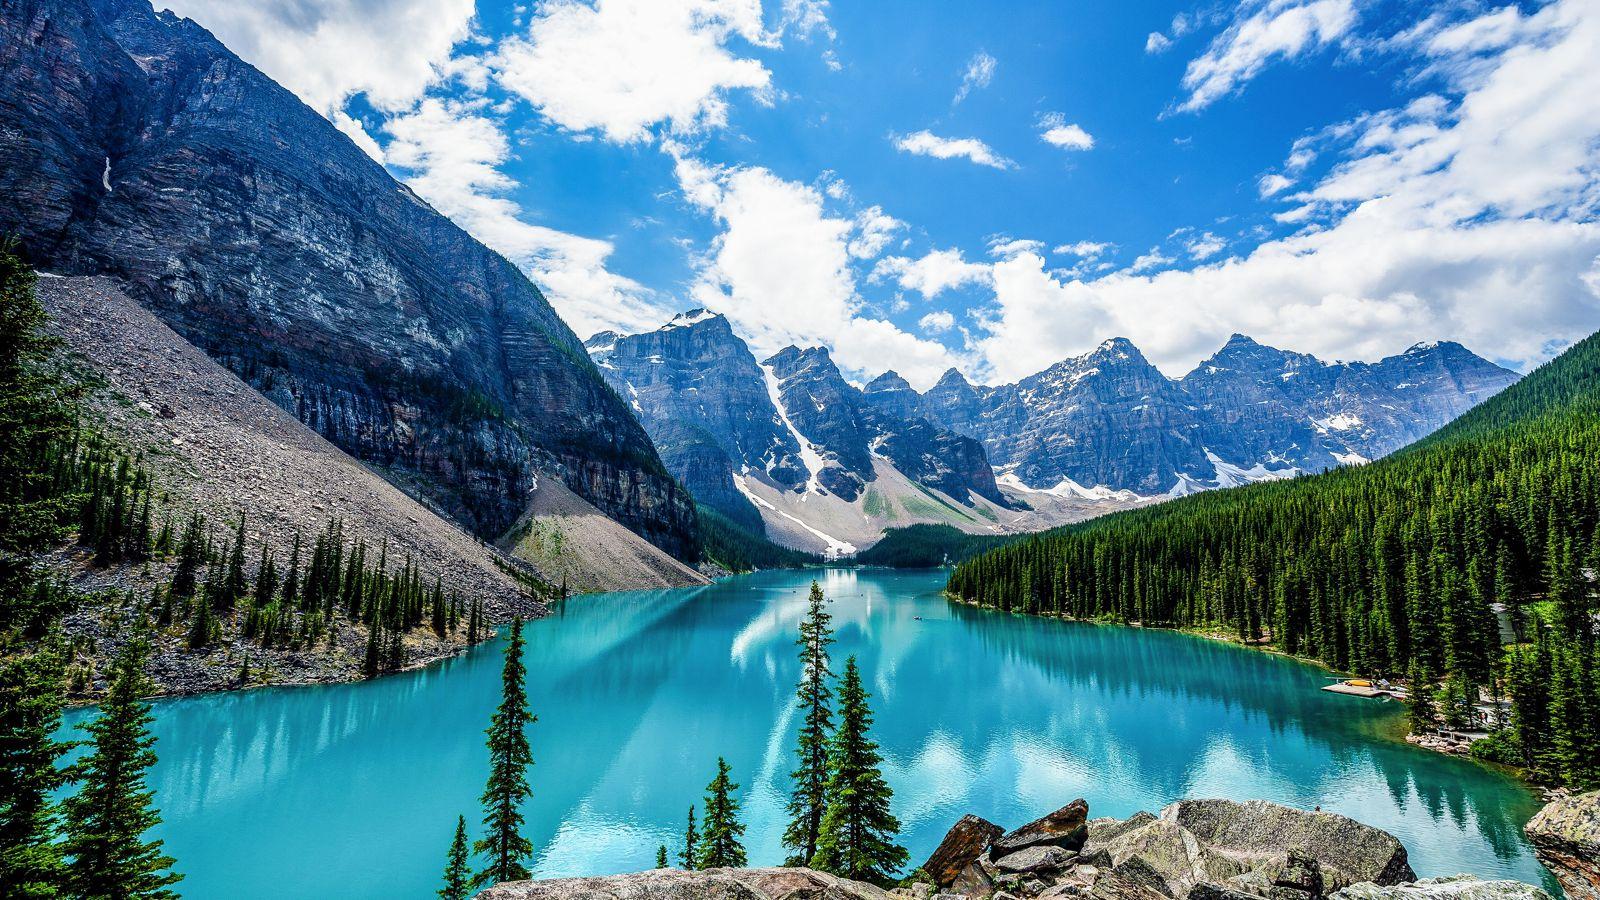 World famous Lake Louise